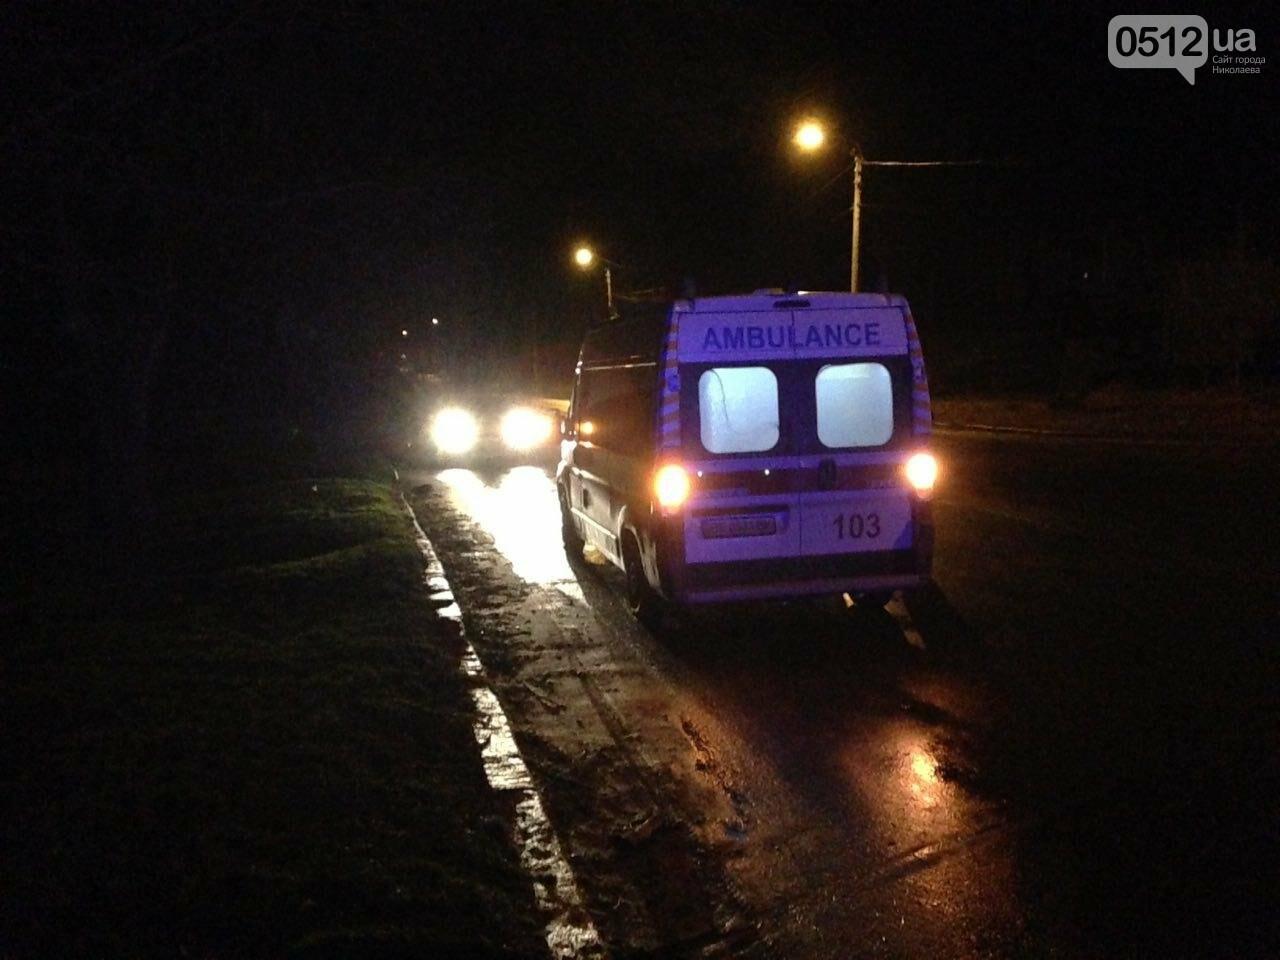 Страшное ДТП в Николаеве: 2 парня и 2 девушки на Мазде влетели в дерево - водитель умер на месте аварии, - ФОТО, фото-2